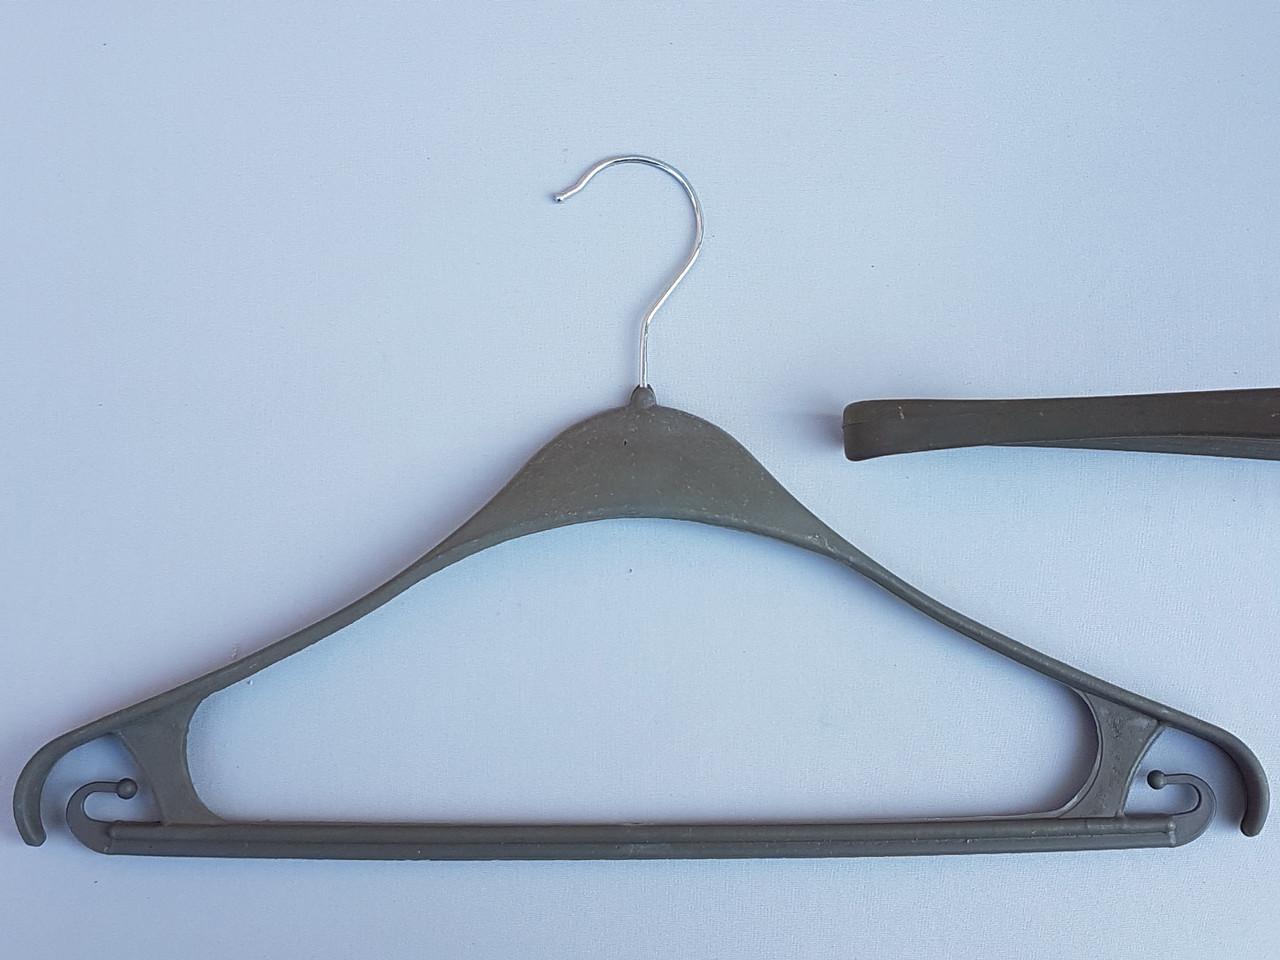 Длина 40 см. Плечики вешалки пластмассовые Турок цвета хаки